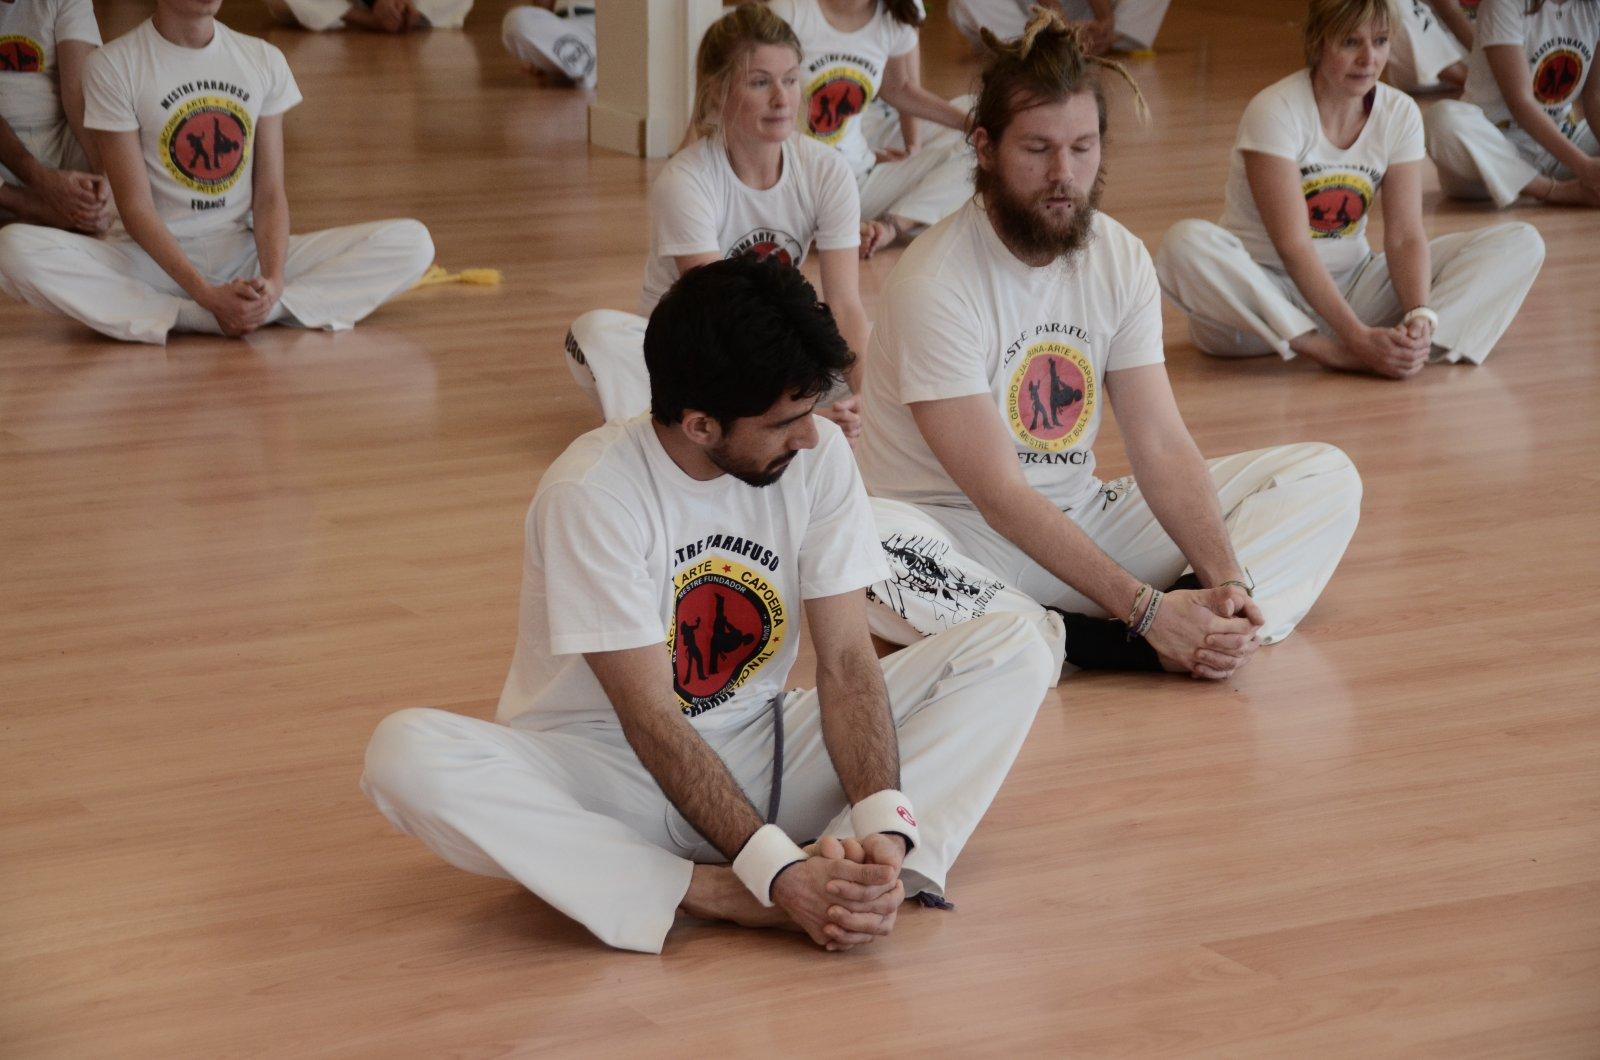 Roda E Galette 2018 Capoeira Nantes (3)